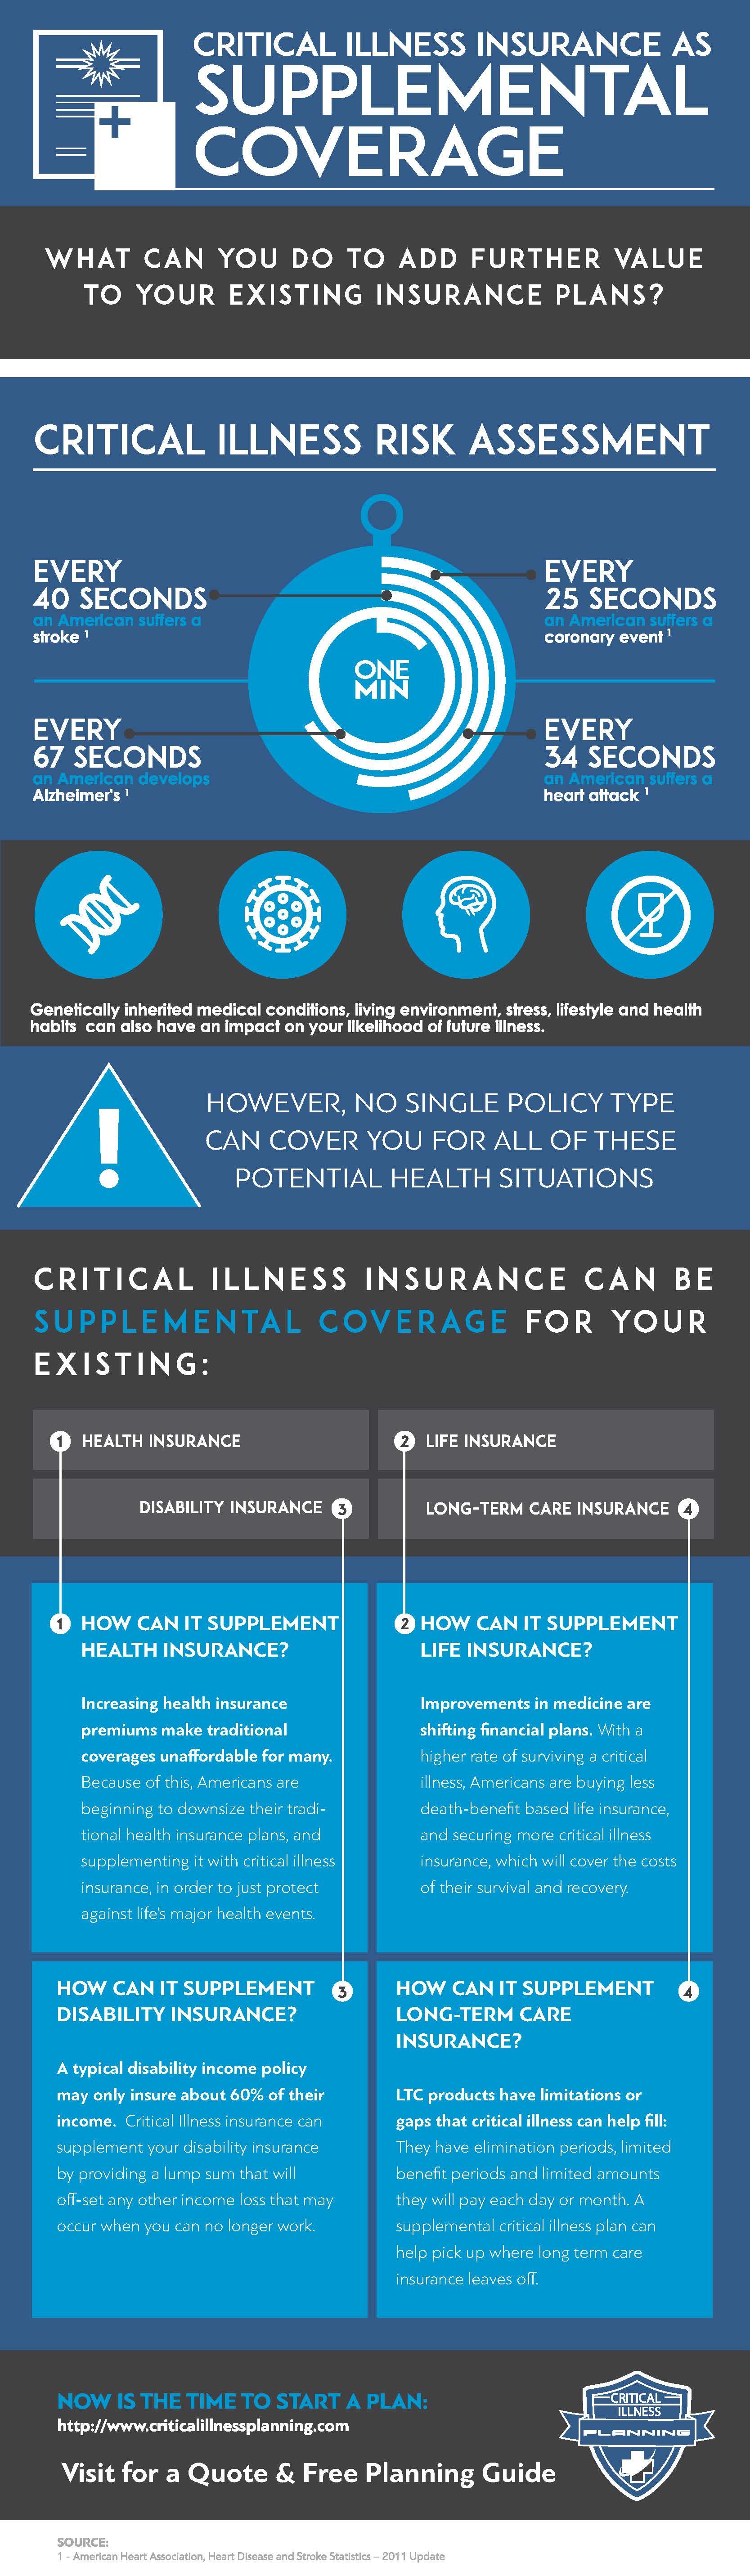 Infographic credit: Critical Illness Planning